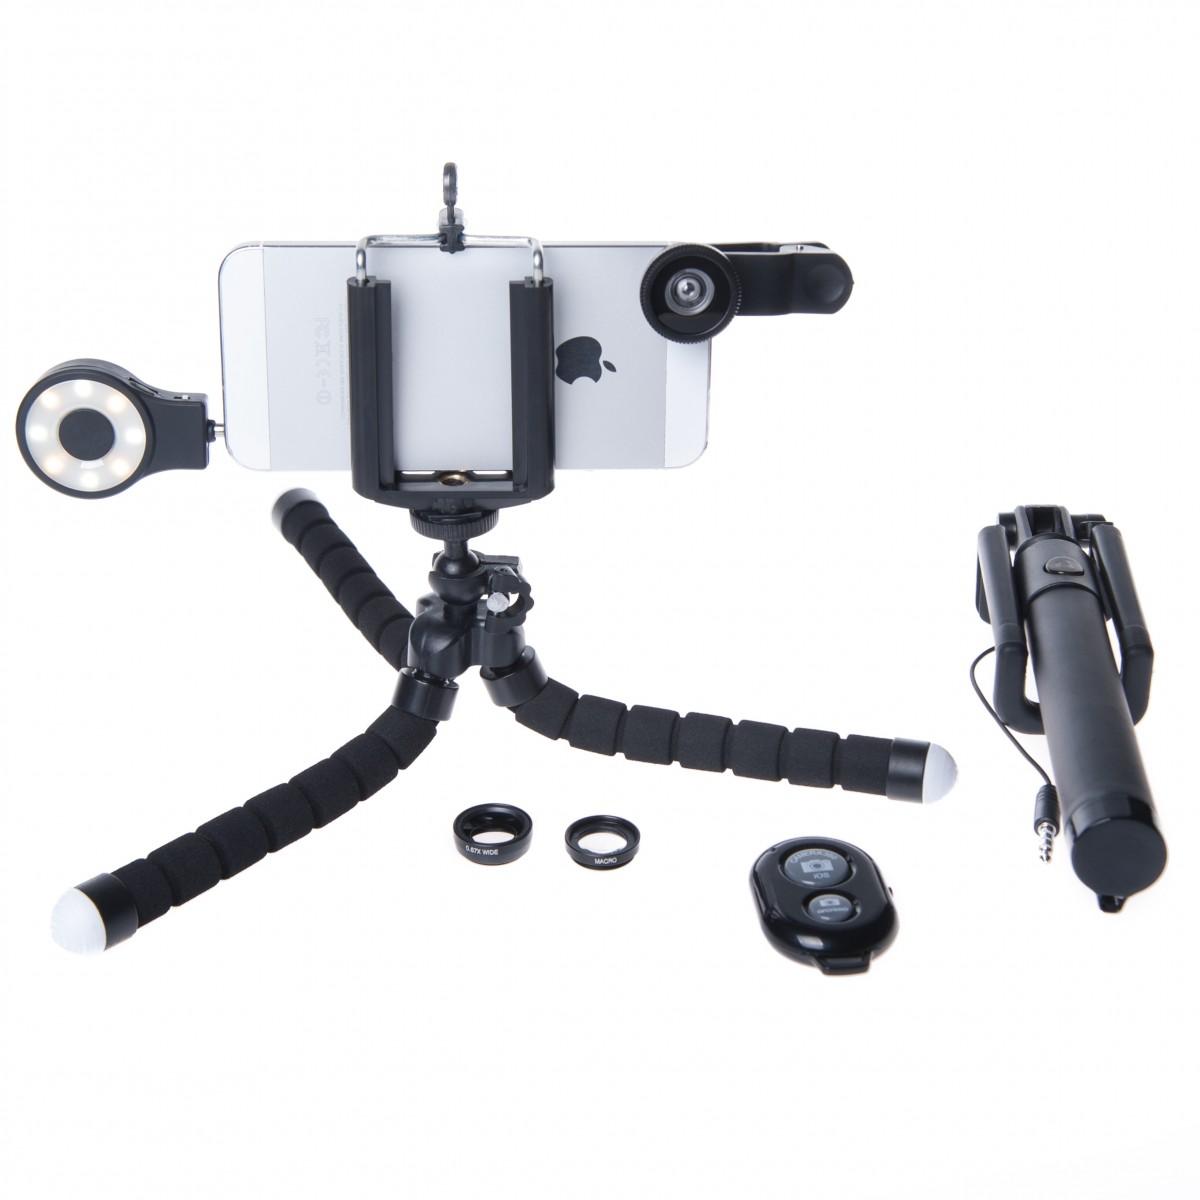 Photography Kit for BlackBerry PRIV: Phone Lens, Tripod, Selfie, stick,  Remote, Flash